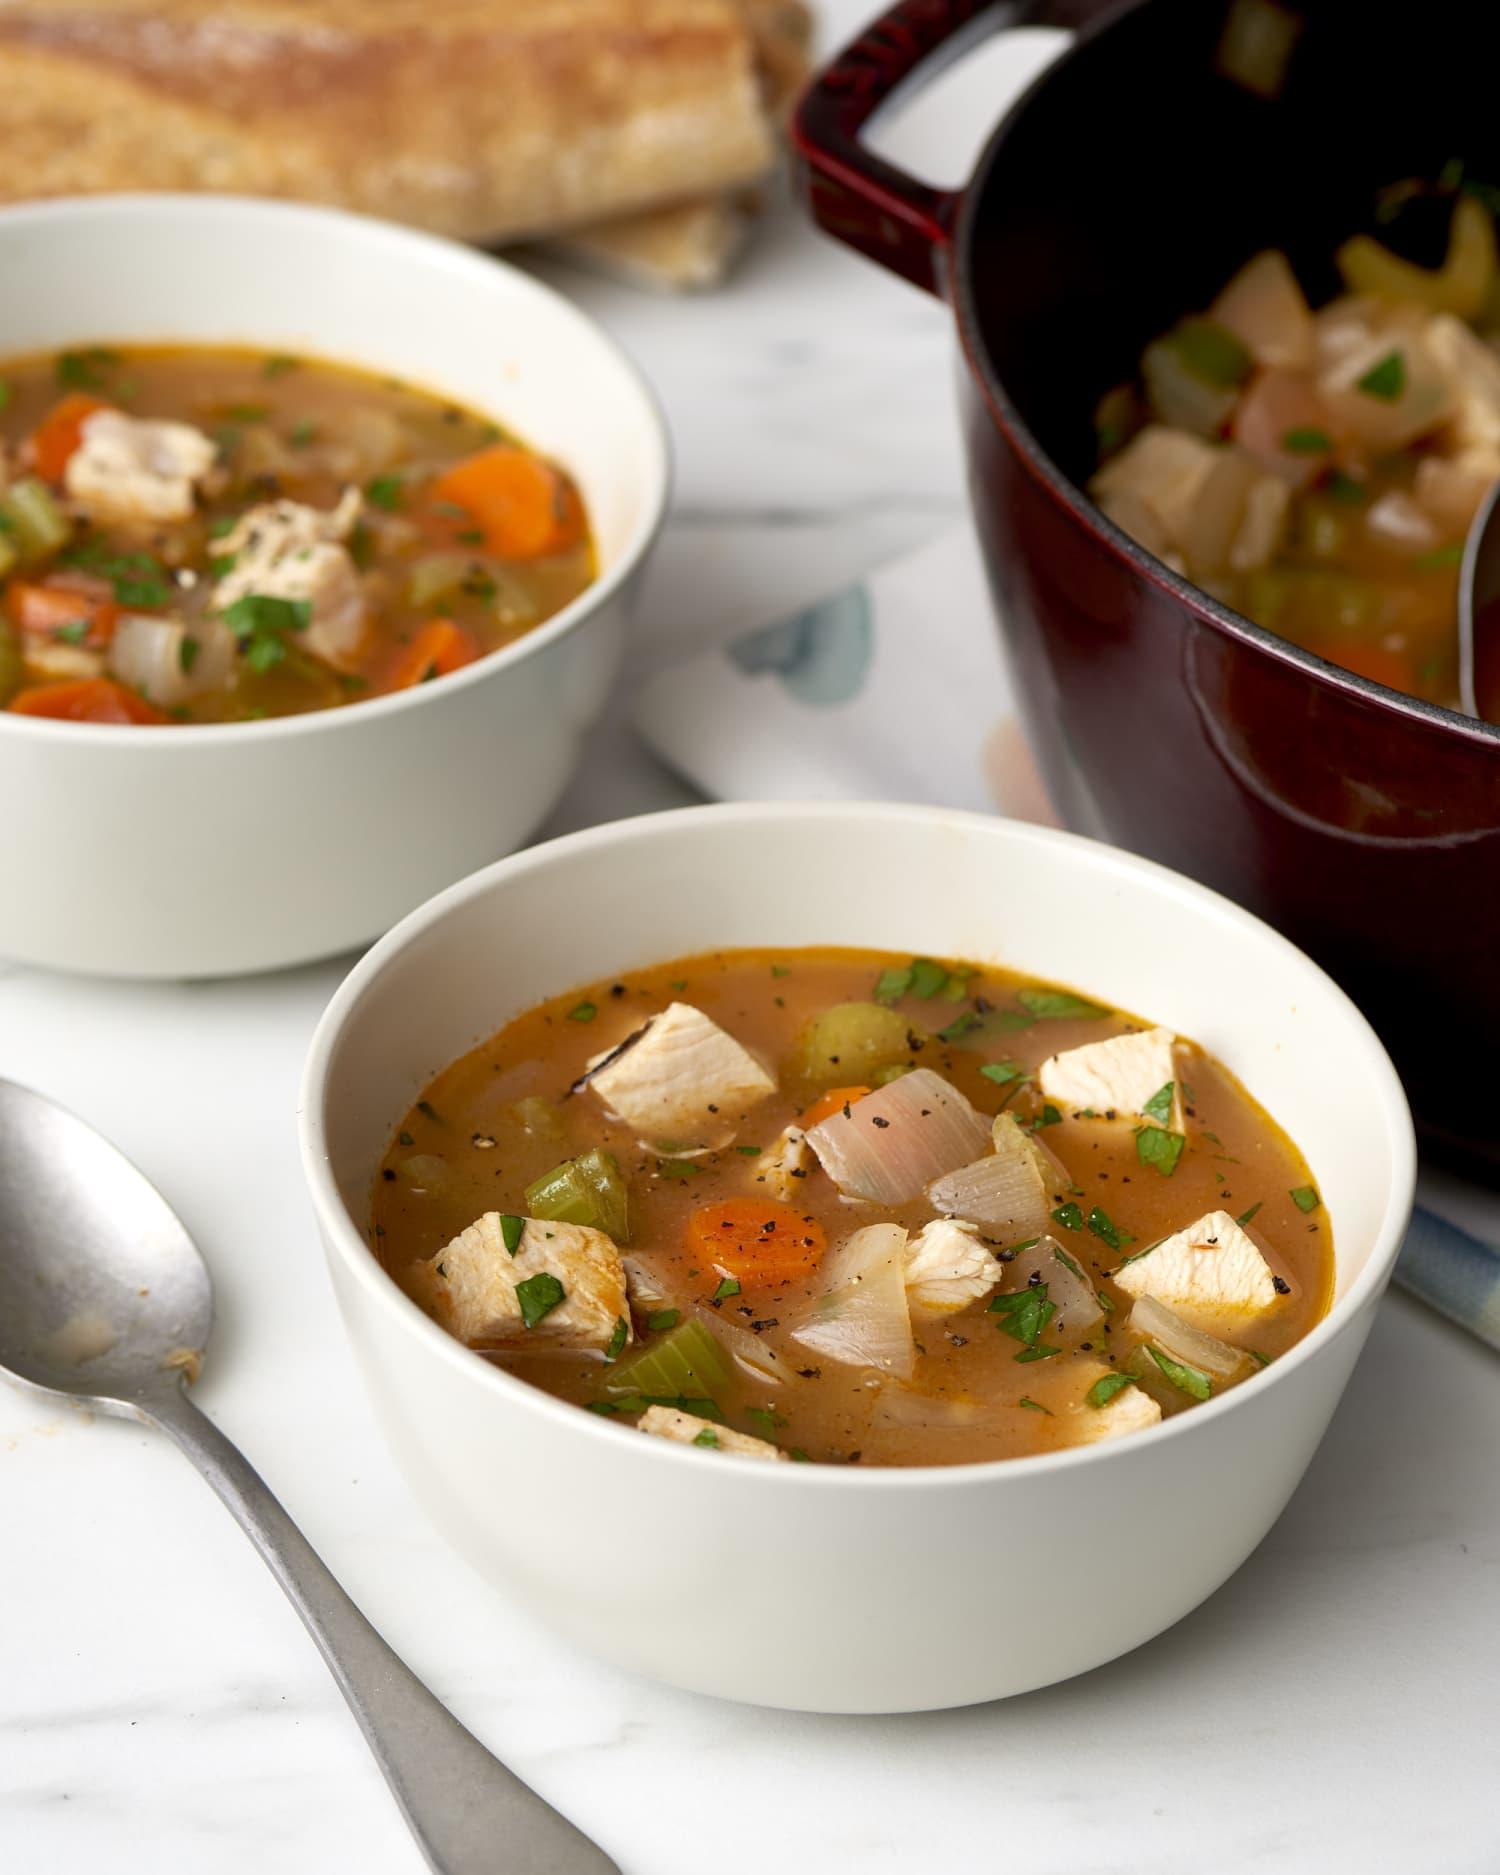 Post-Thanksgiving Turkey Vegetable Soup